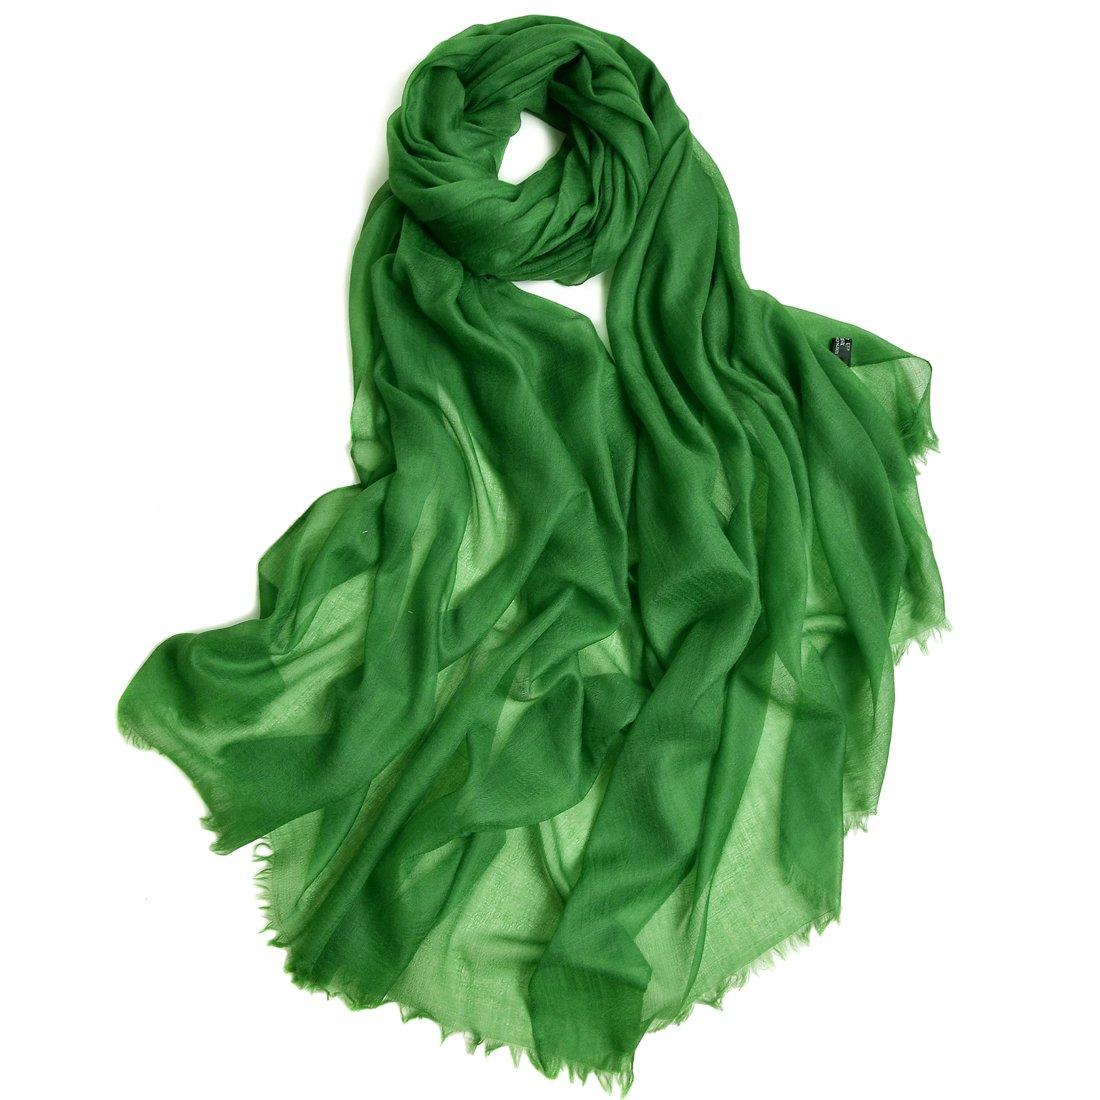 ZORJAR Pure Cashmere Scarf Women Ultra Thin Pashmina Shawls and Wraps 39''x94''(DarkGreen)